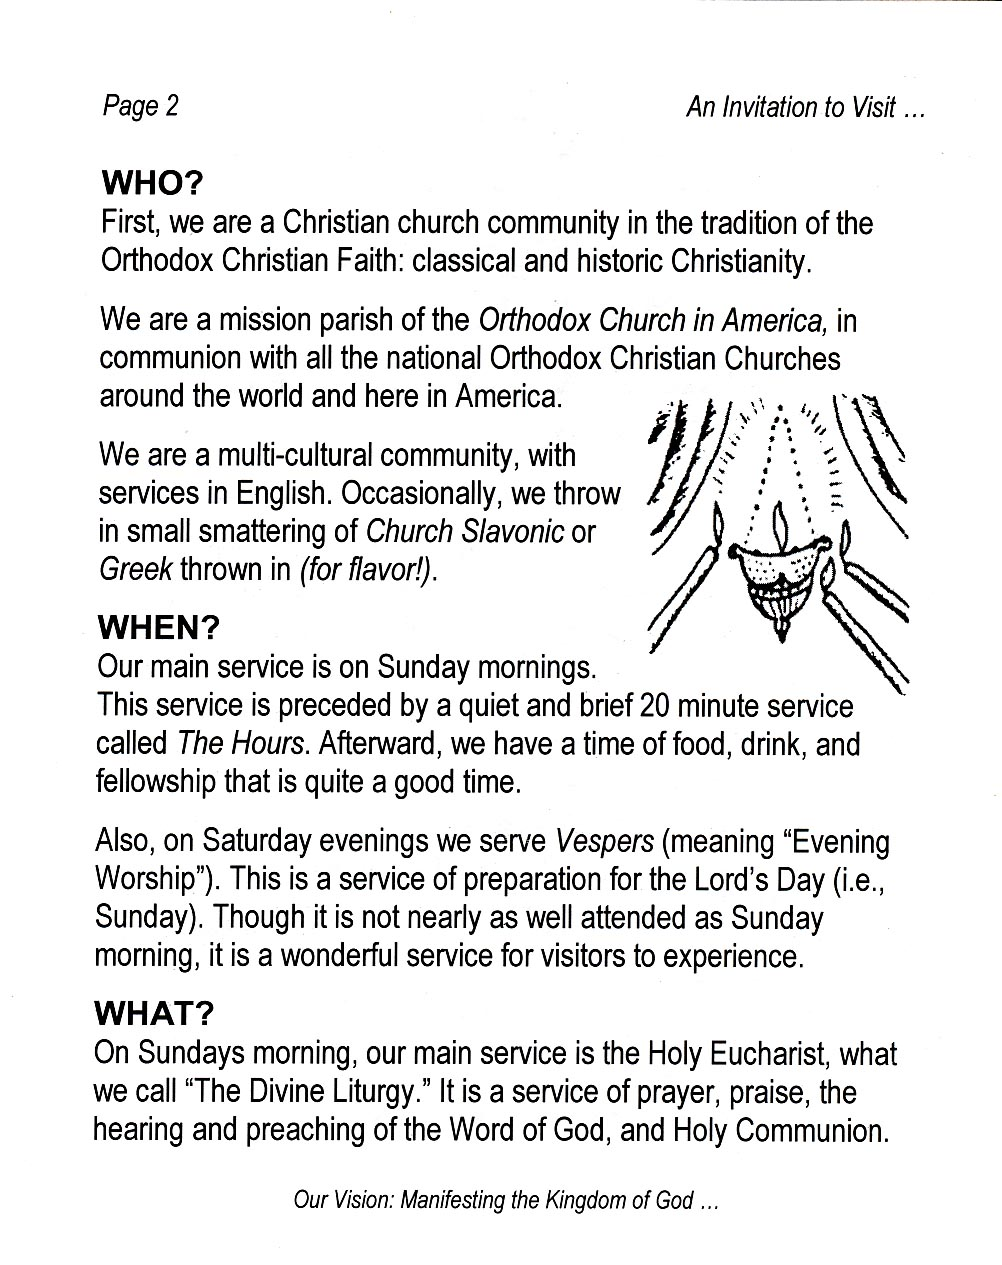 St mary magdalene orthodox church invitation to worship members stopboris Choice Image